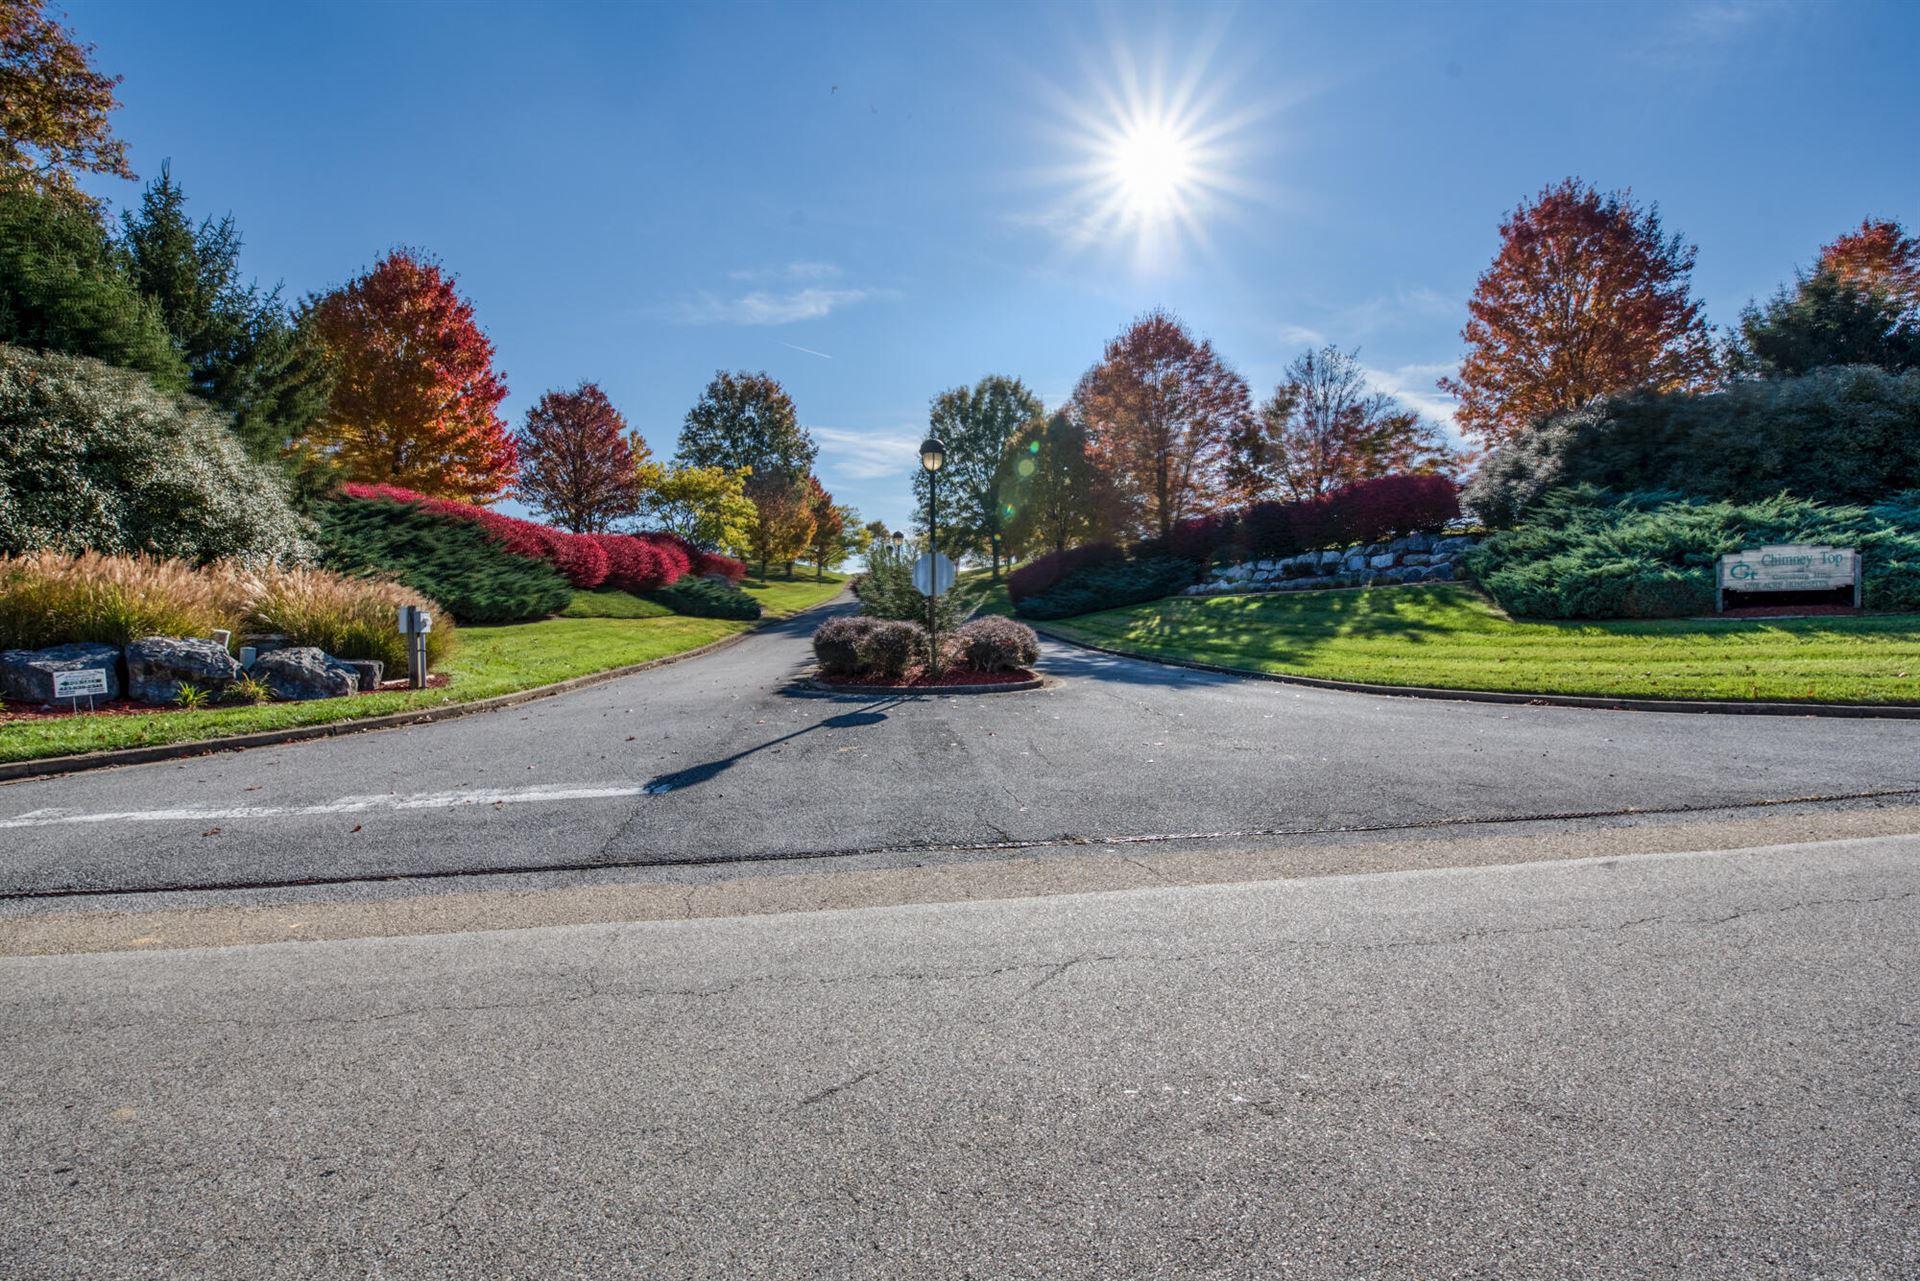 Photo of Lot 59 Chimney Top Lane, Chuckey, TN 37641 (MLS # 9928666)